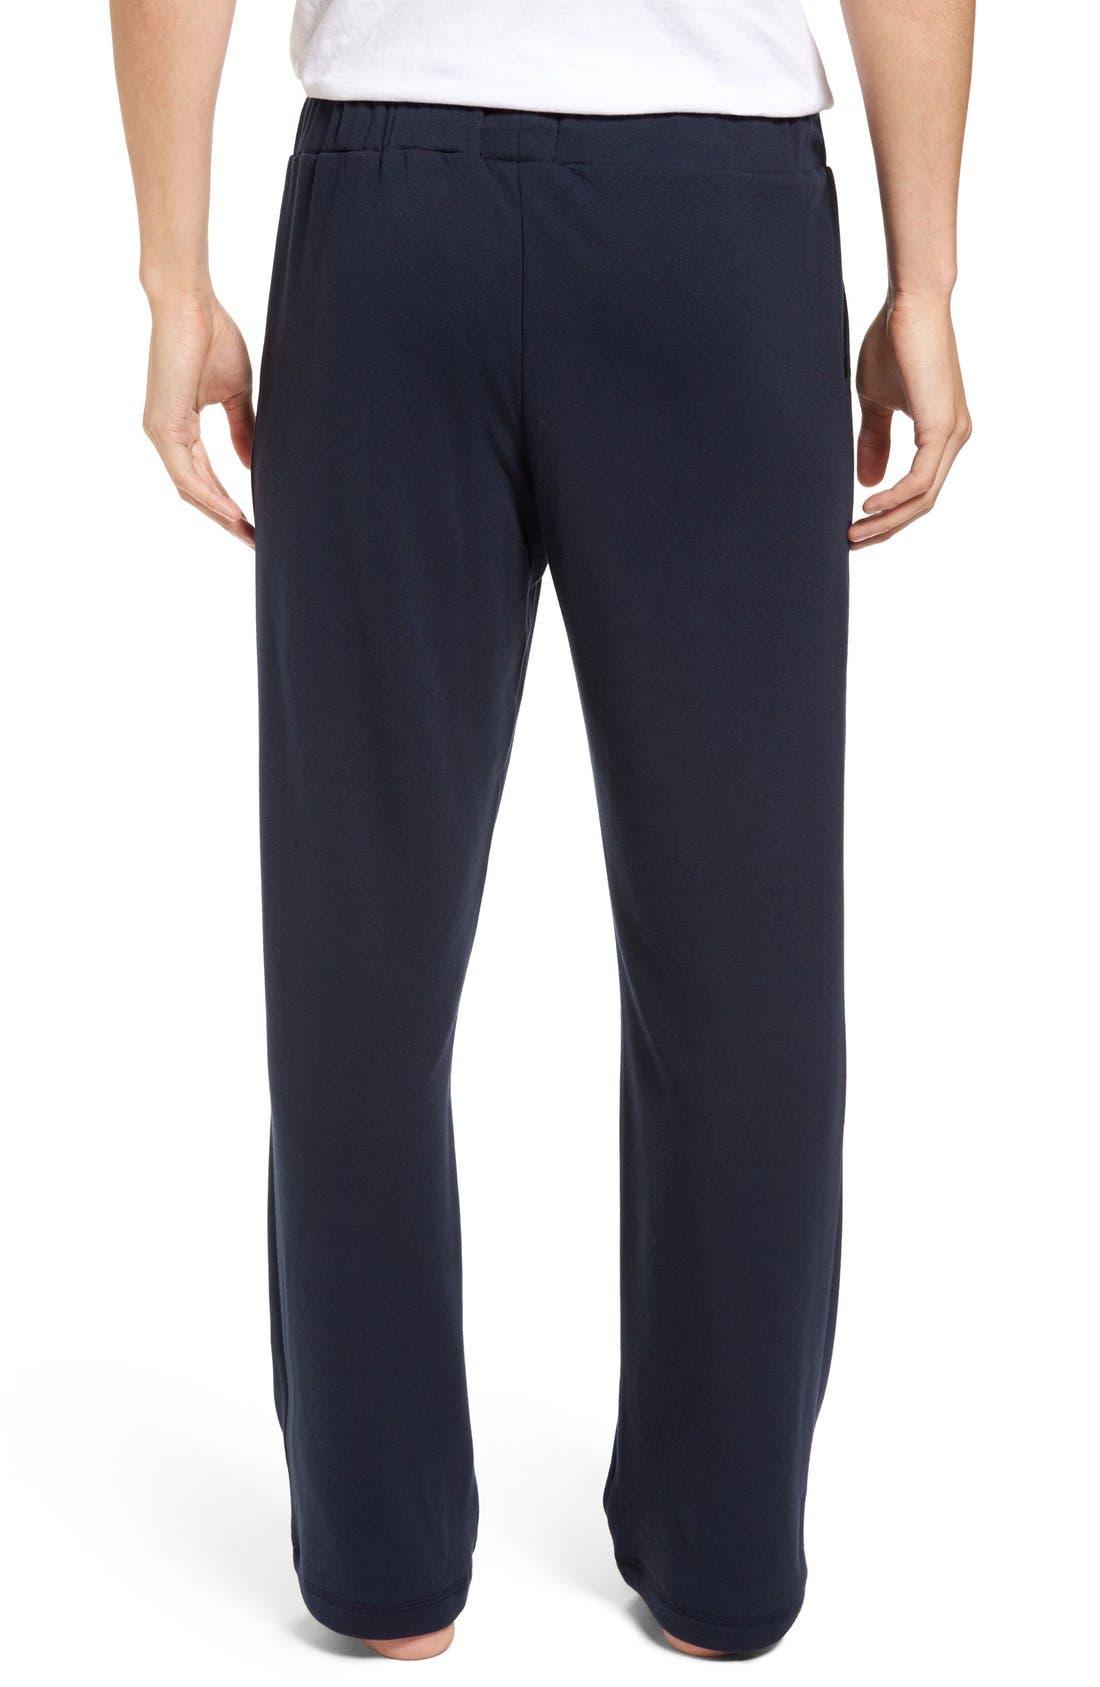 Alternate Image 2  - Nordstrom Men's Shop Fleece Lounge Pants